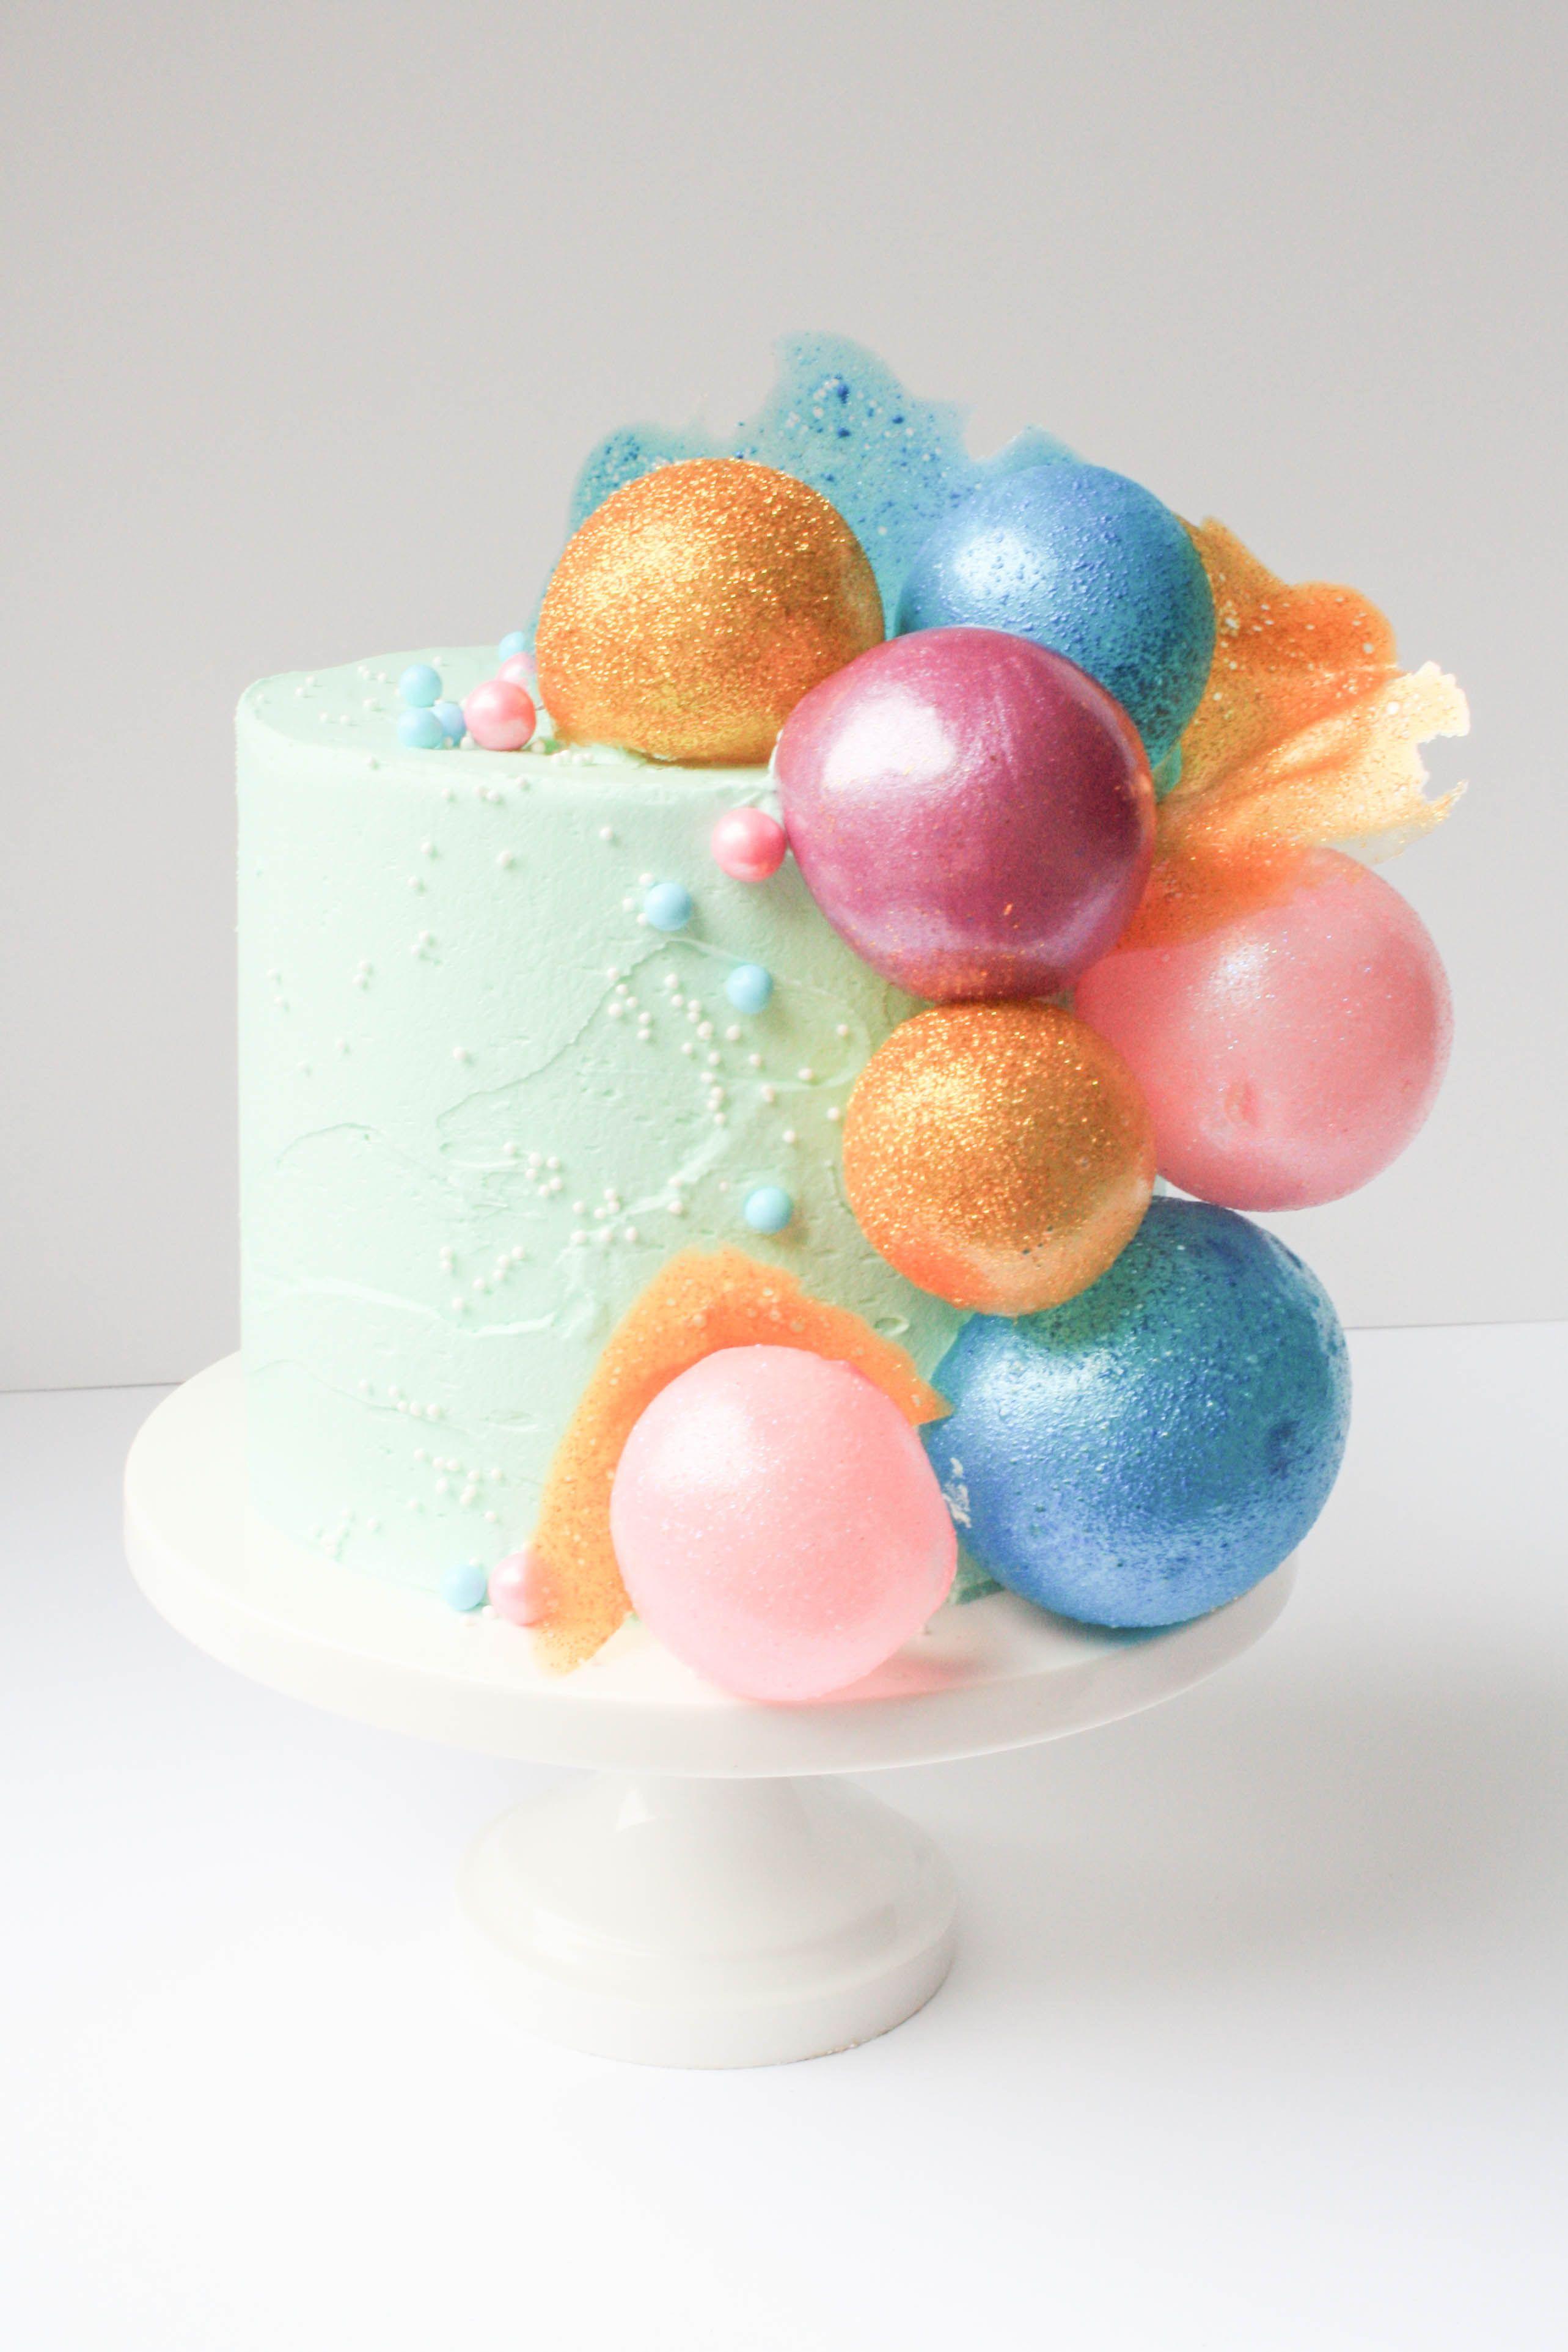 Pop pop fizz fizz Learn how to make gelatin bubbles that will